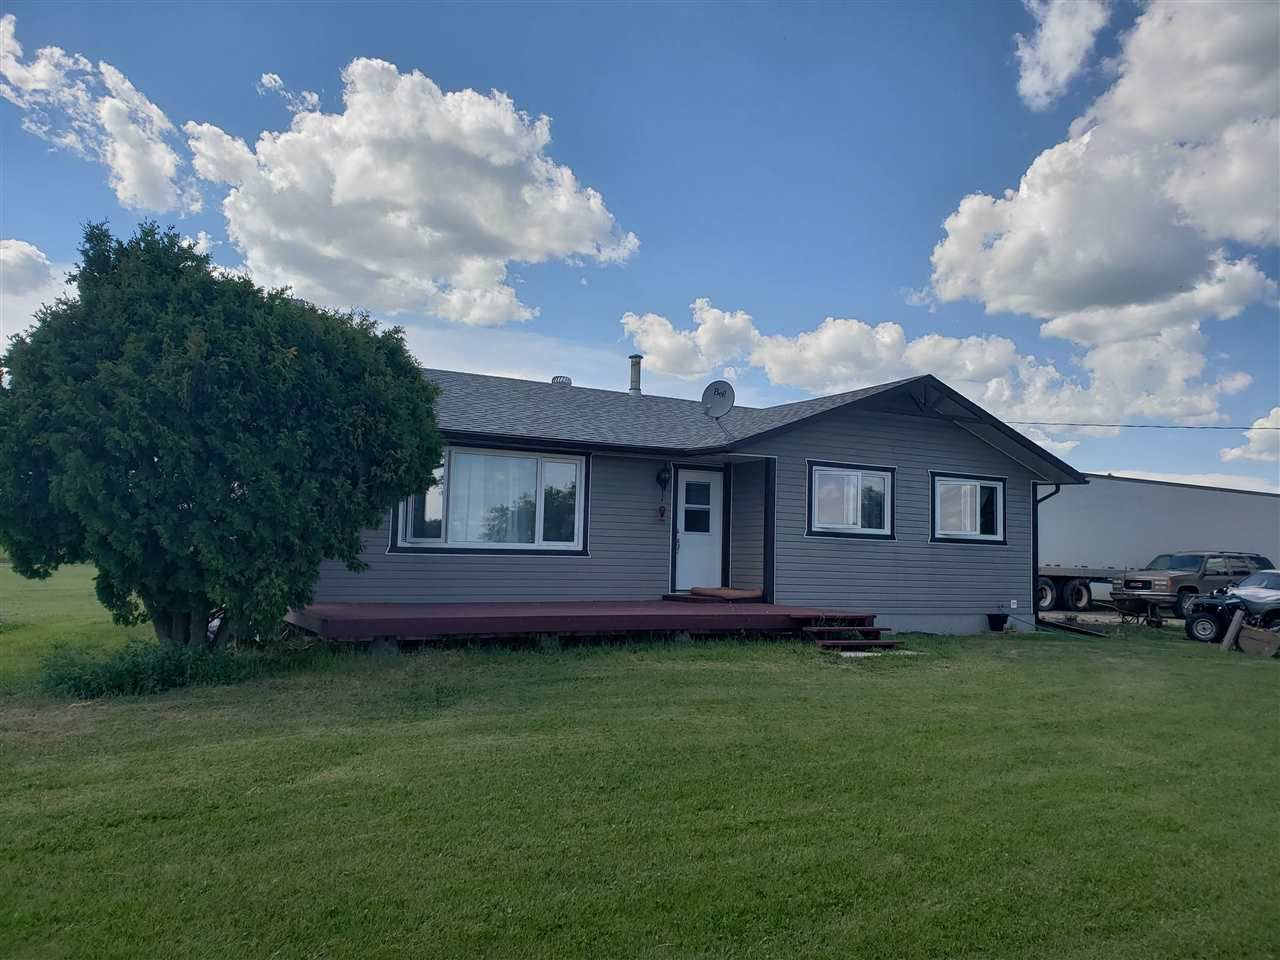 Main Photo: 55020 Range Road 74: Rural Yellowhead House for sale : MLS®# E4117838